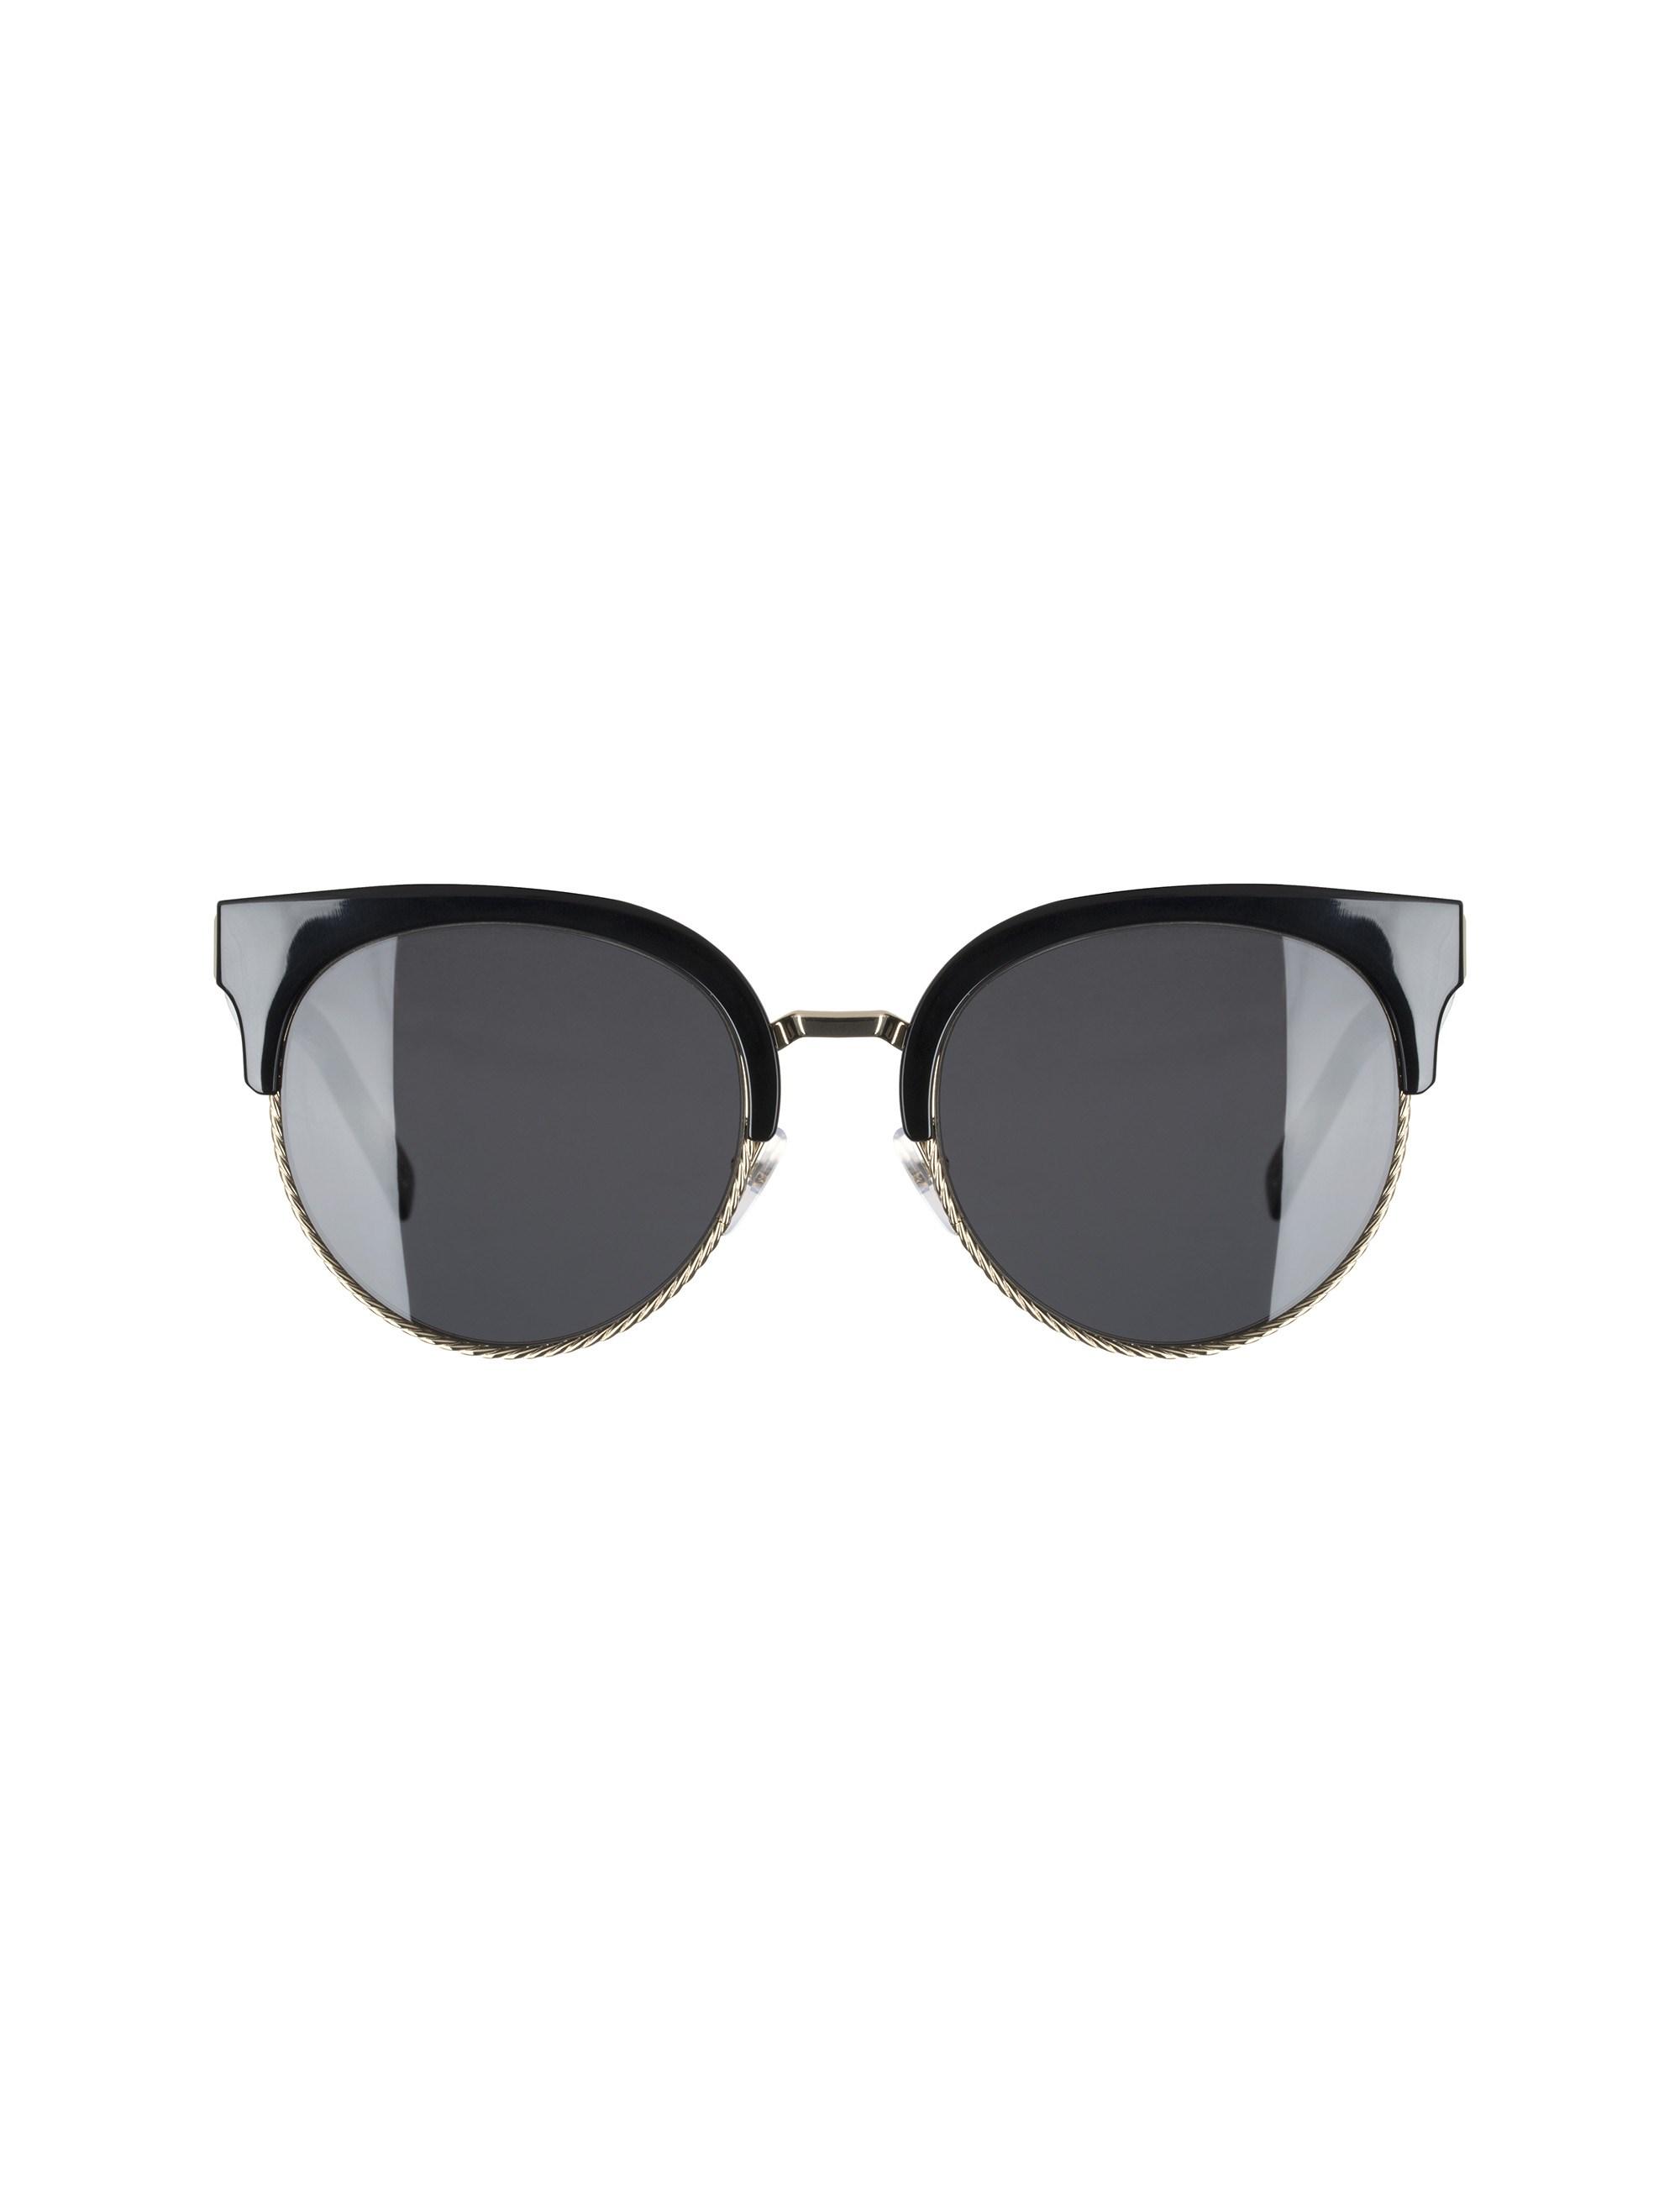 عینک آفتابی کلاب مستر زنانه